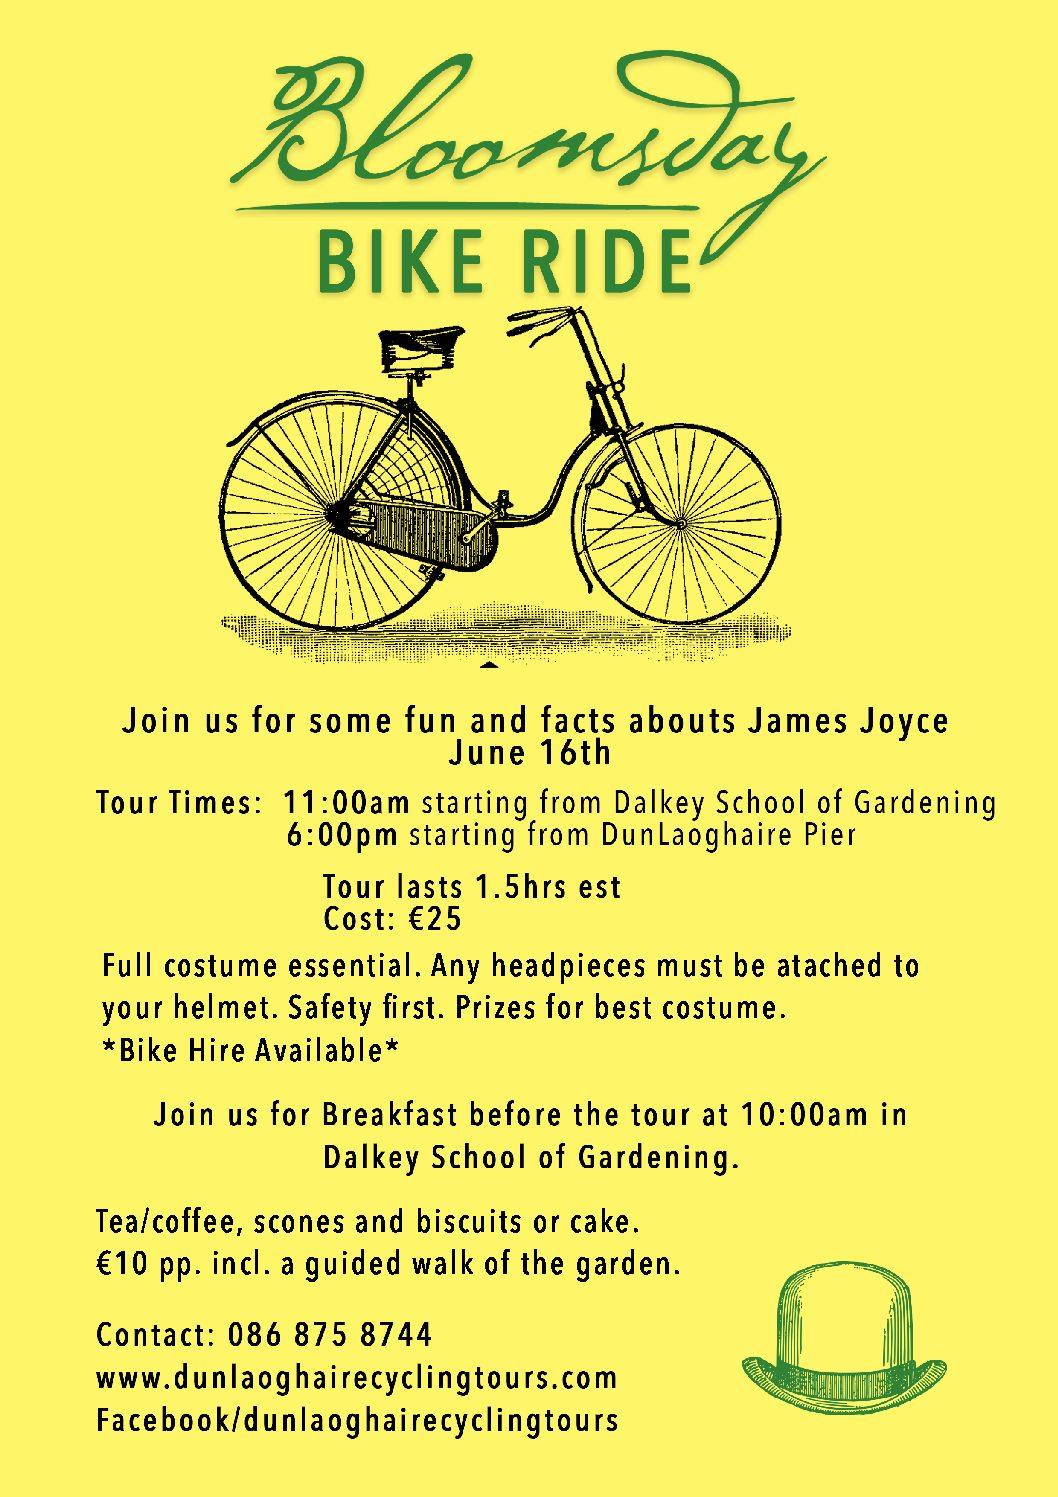 bloomsday-bike-ride-ed-pdf